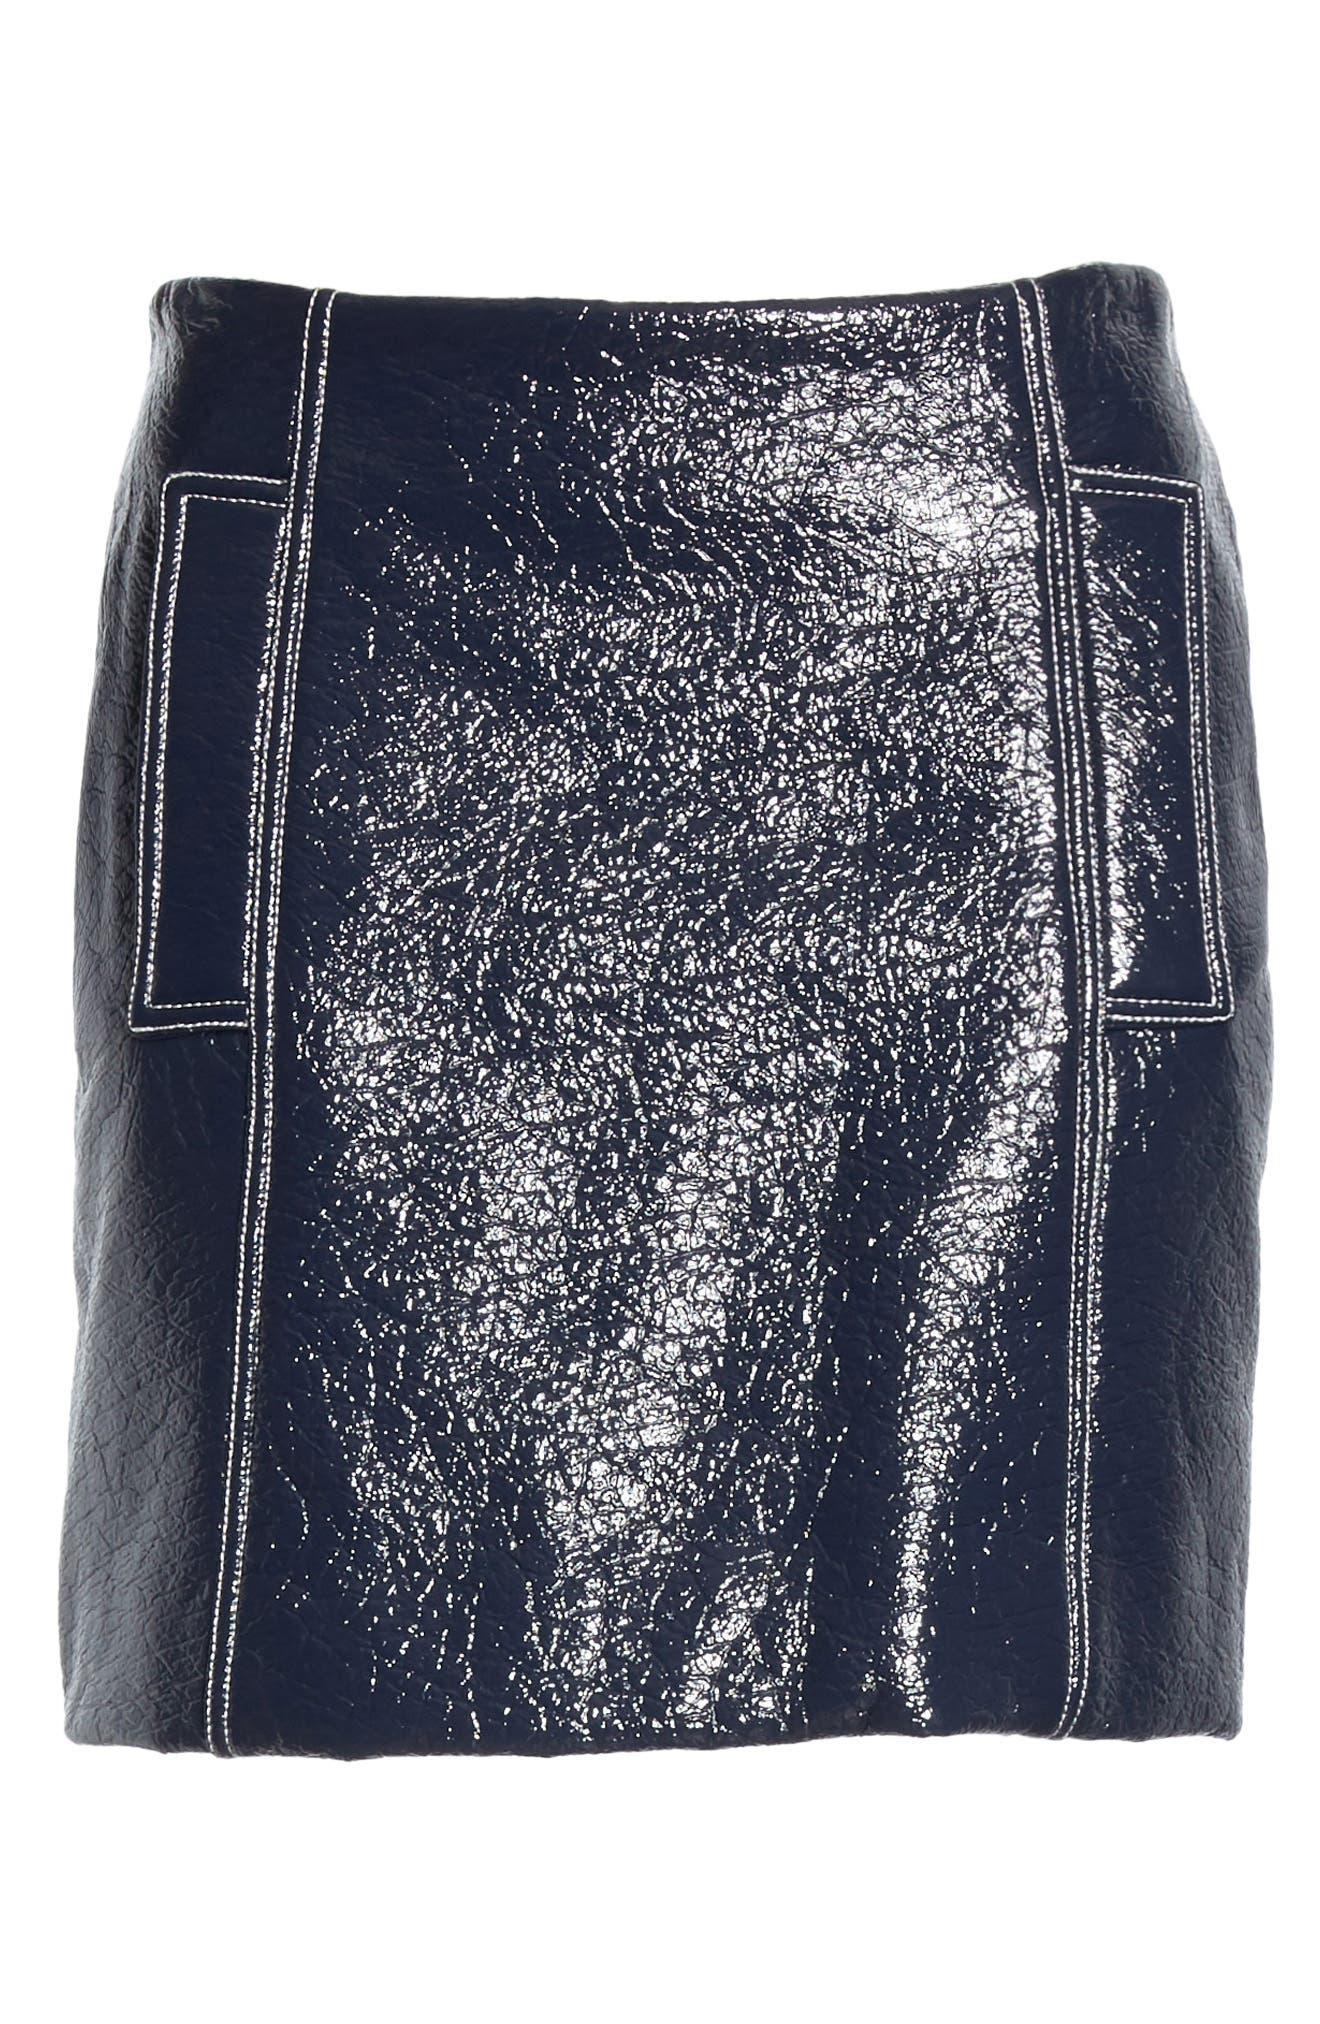 Vara Crinkle Faux Patent Leather Miniskirt,                             Alternate thumbnail 6, color,                             400